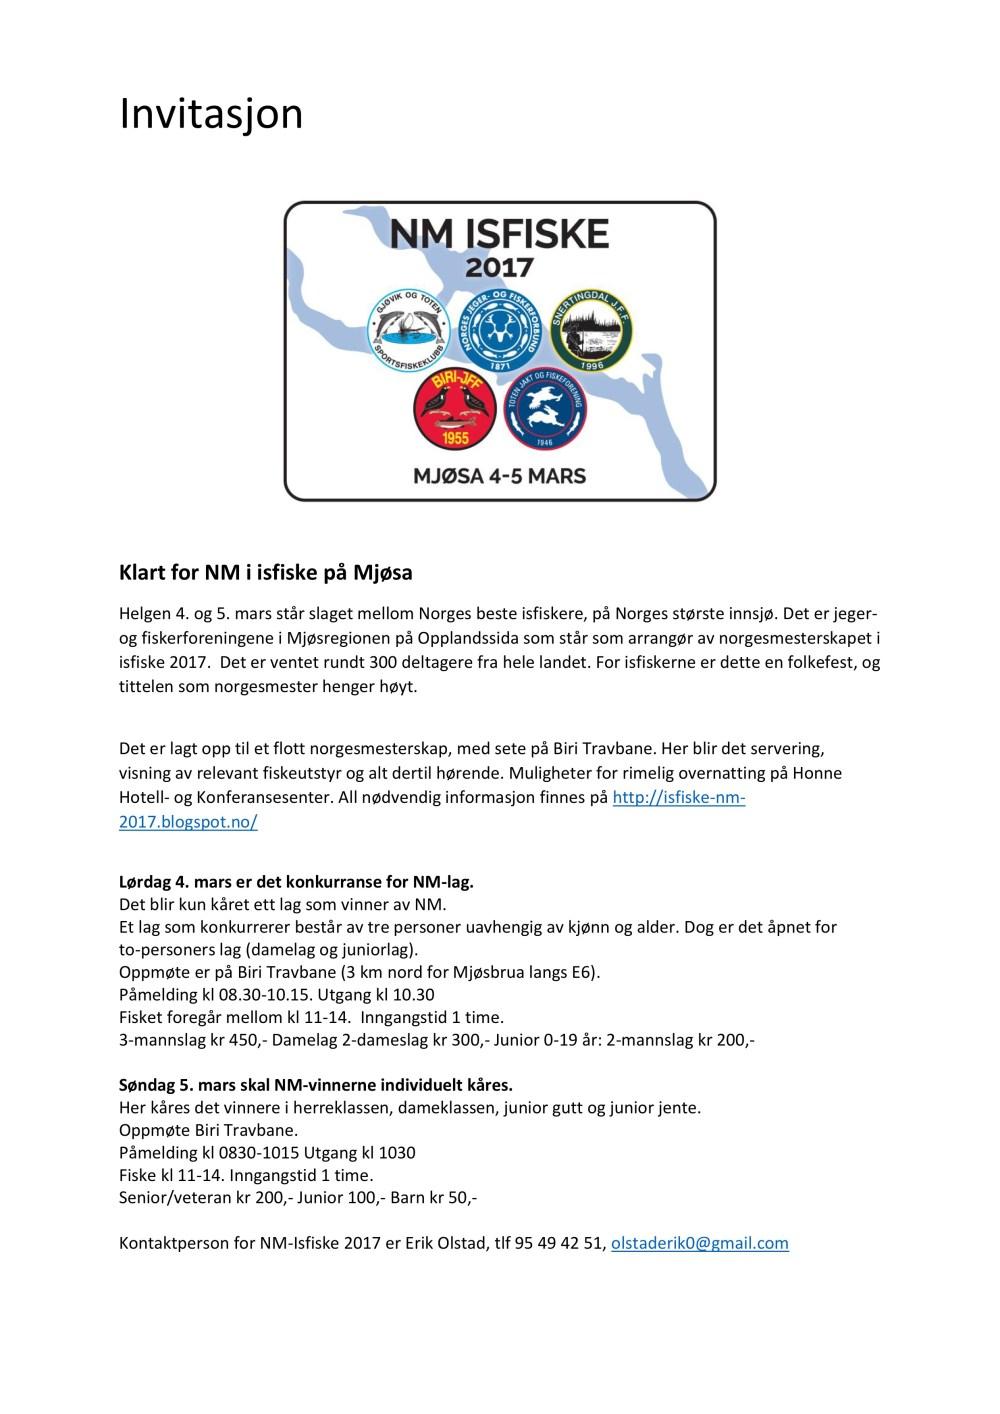 Invitasjon NM Isfiske 2017